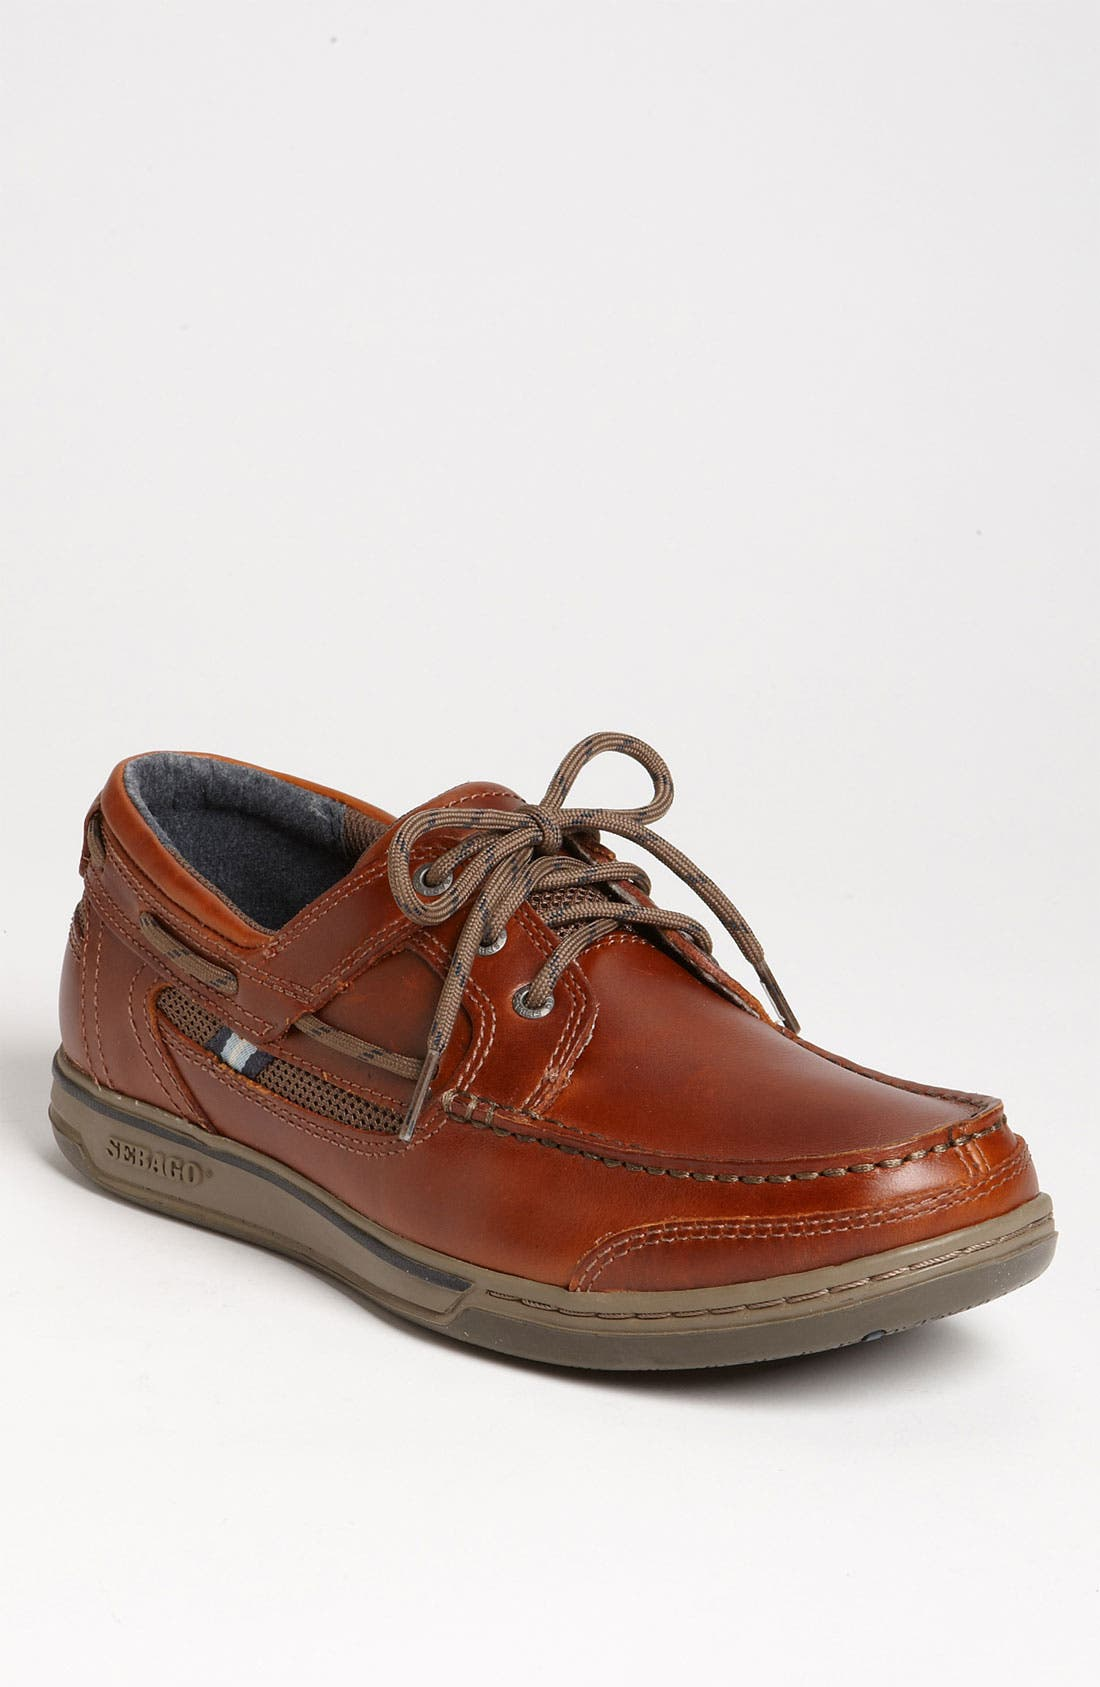 Alternate Image 1 Selected - Sebago 'Triton' Boat Shoe